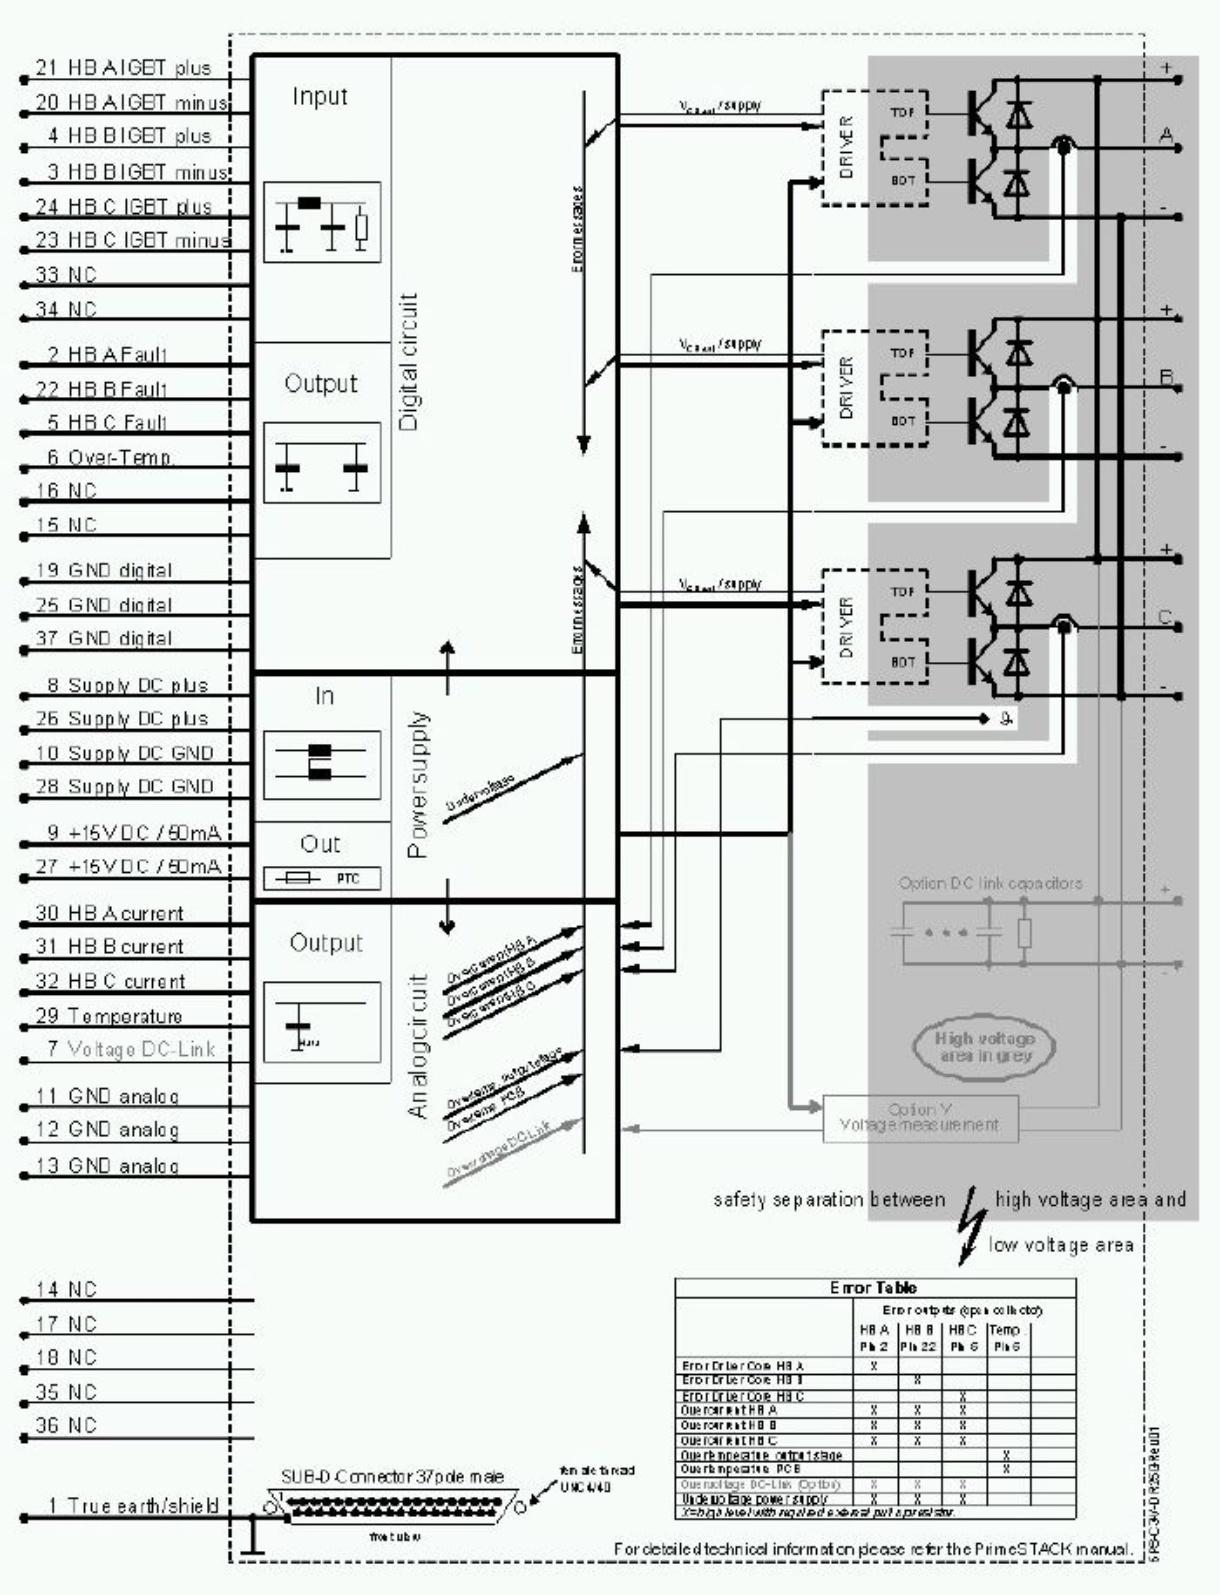 6ps04512e43g37986 Infineon Technologies Contactless Ac Mains Voltage Detector Circuit Diagram Diagrams Prevnext